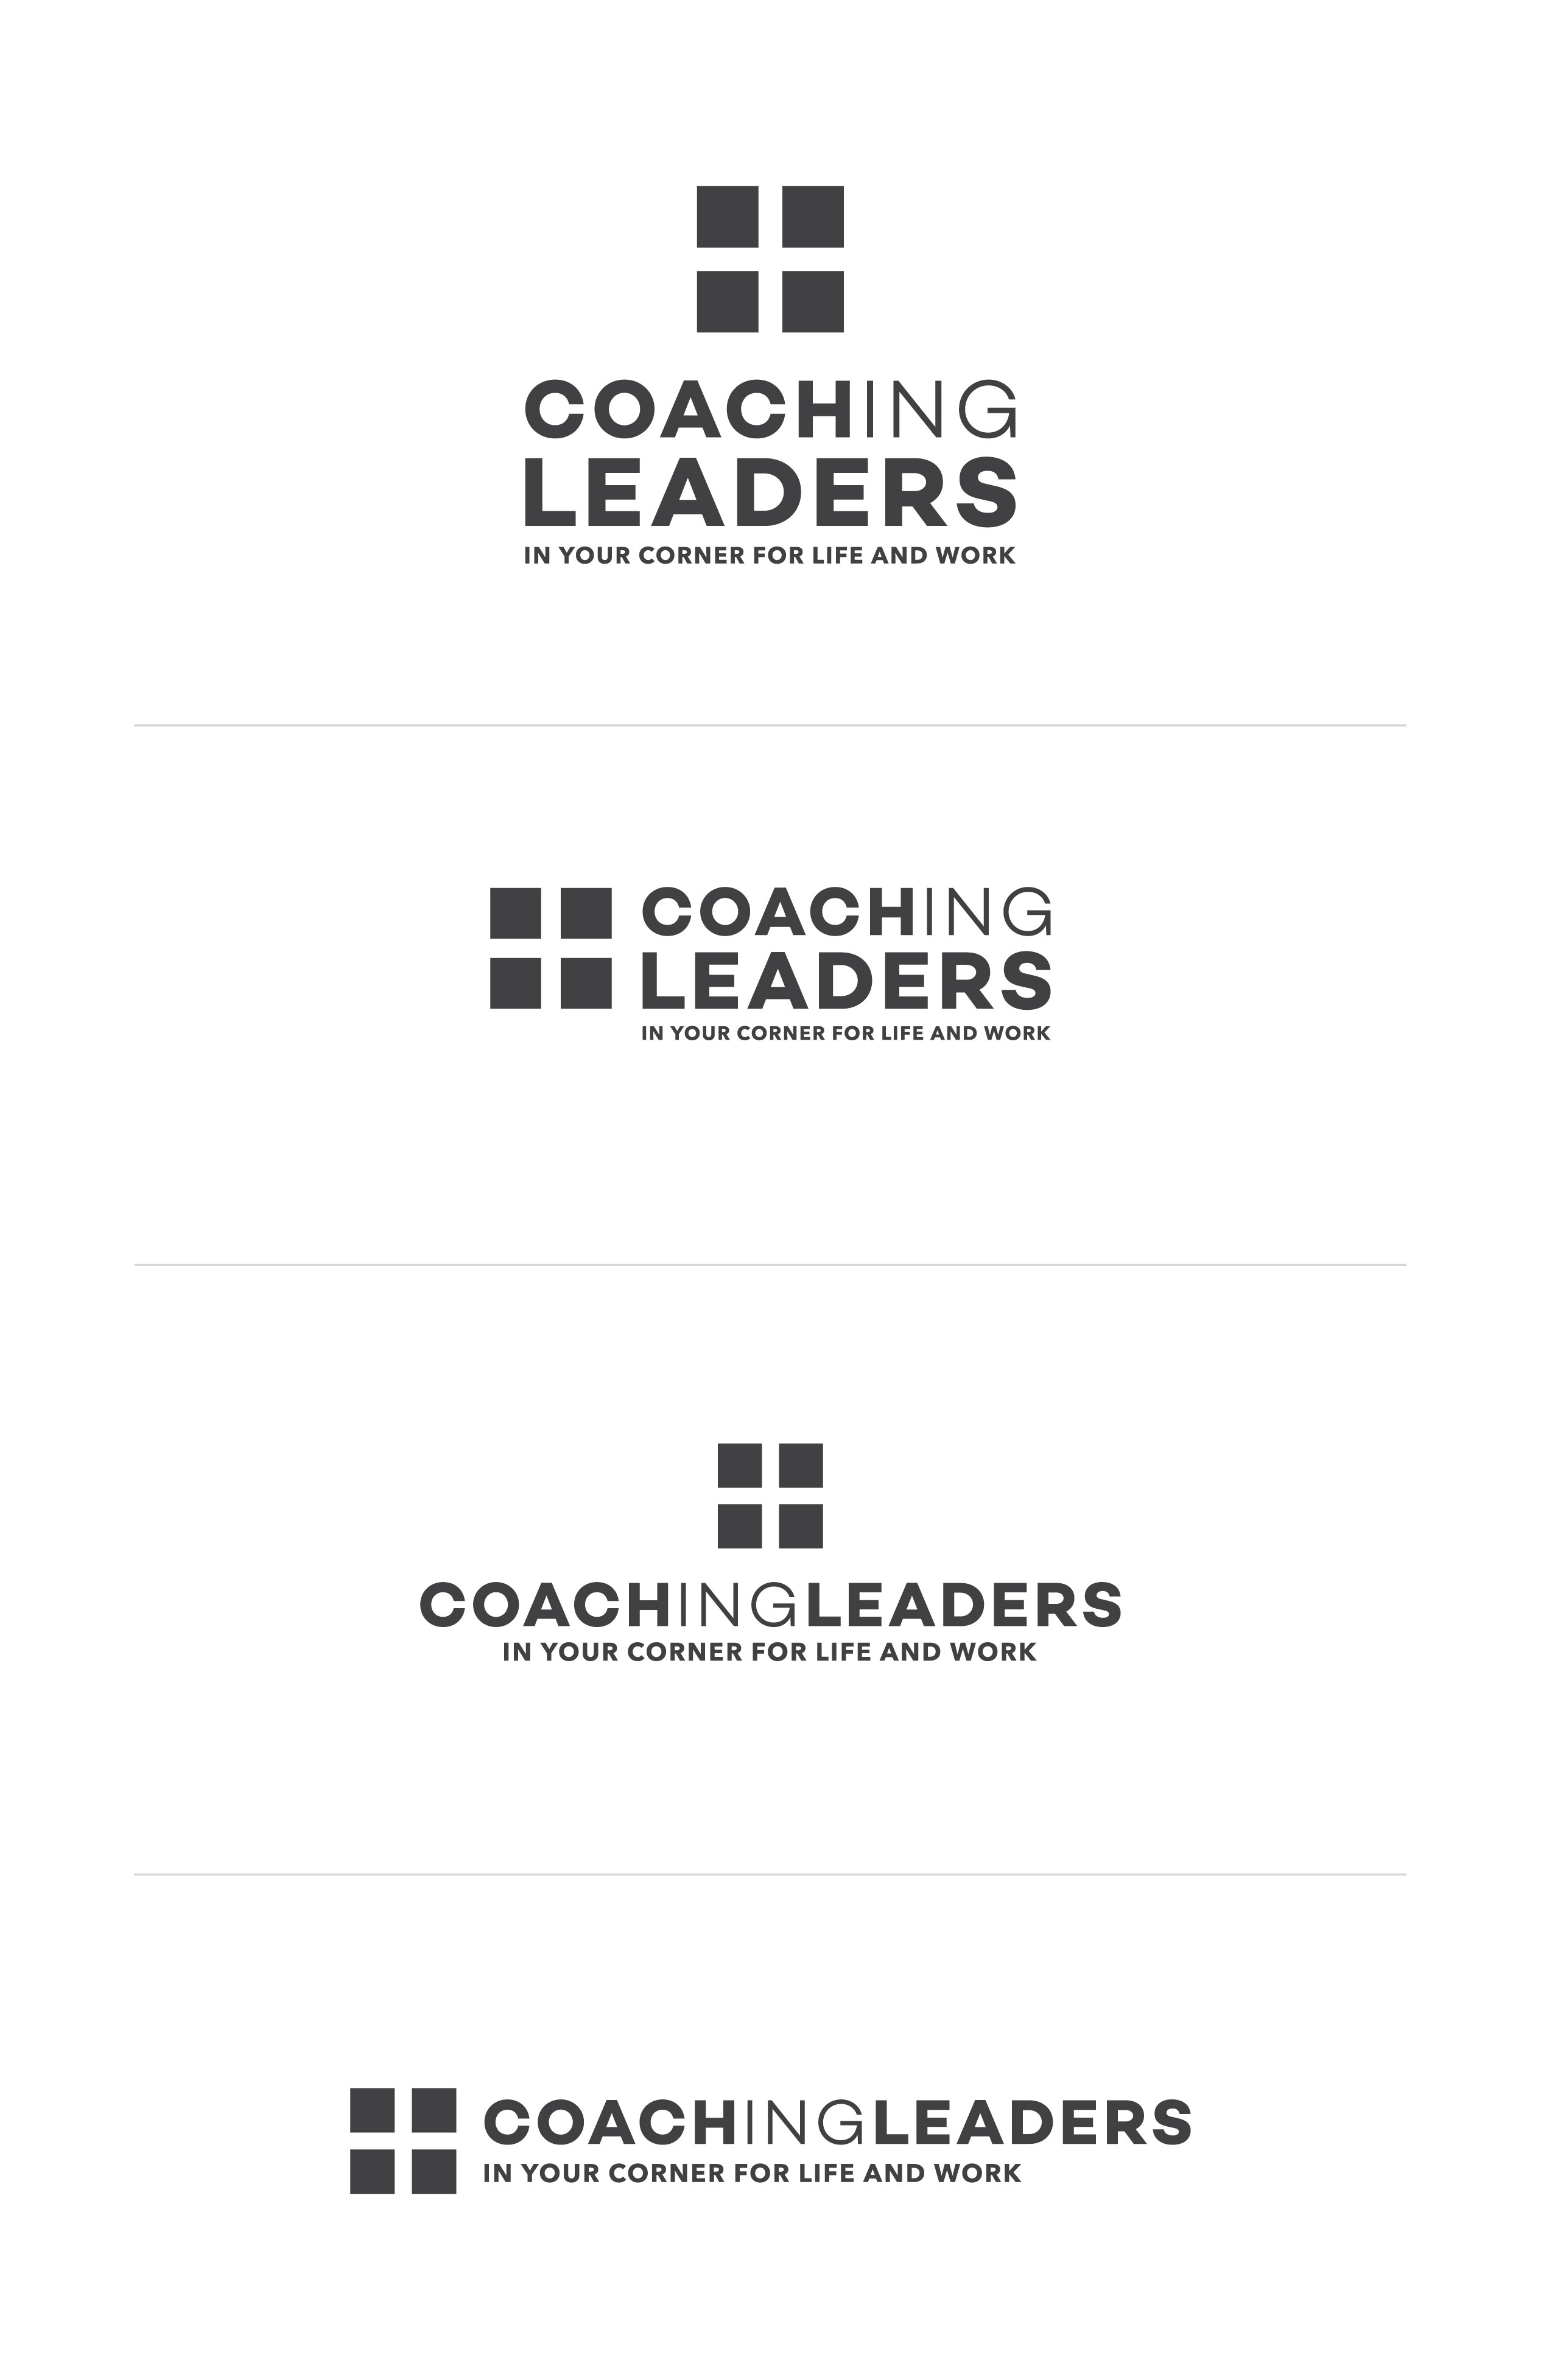 COACHING LEADERS